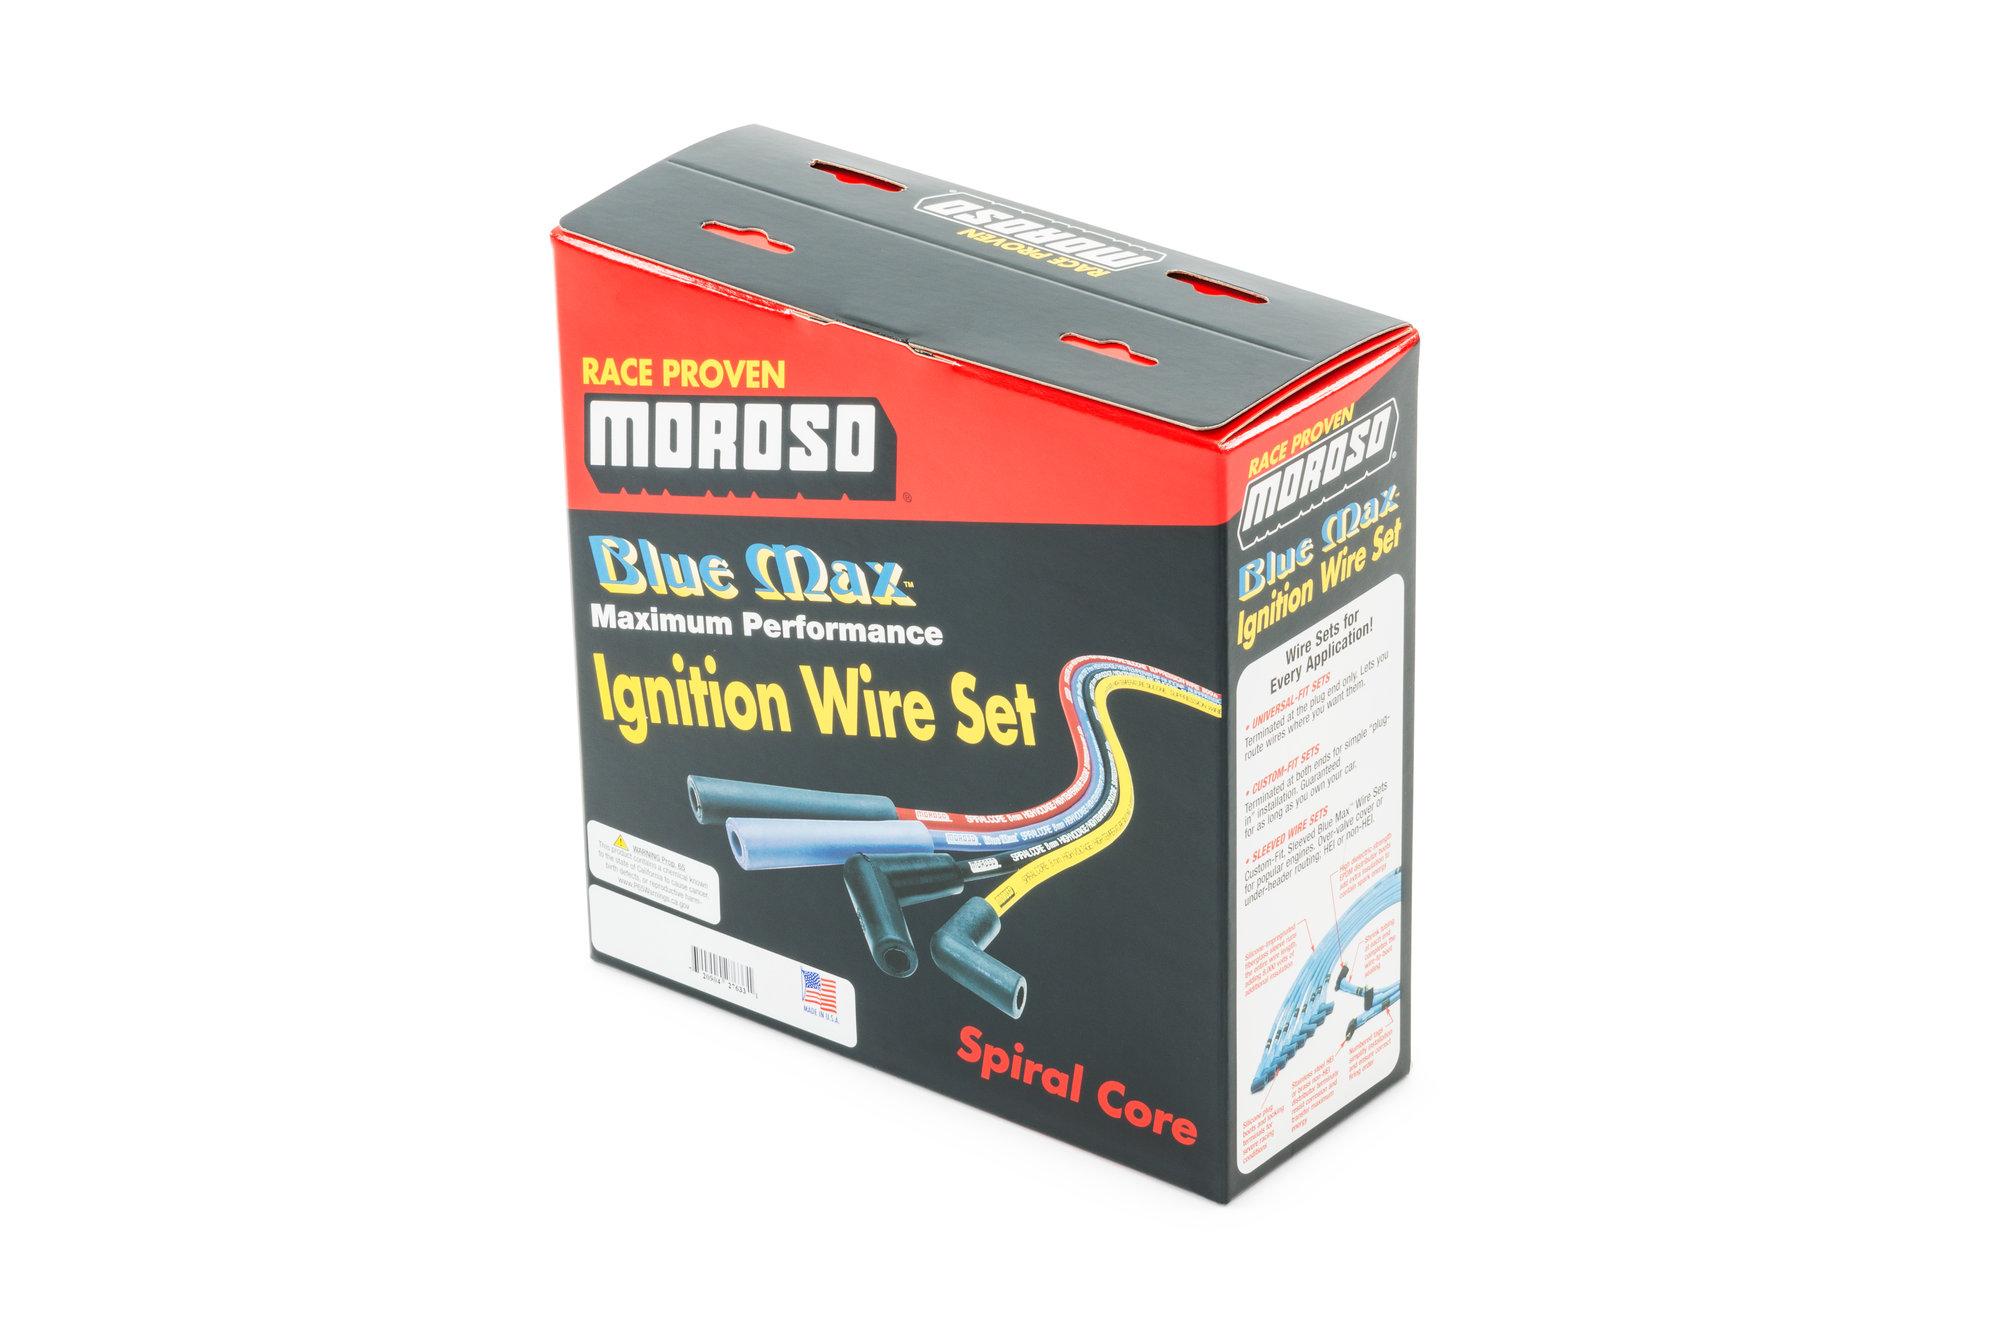 hight resolution of moroso performance blue max spark plug wires for 72 81 jeep cj 5 cj 7 with 304 v8 quadratec